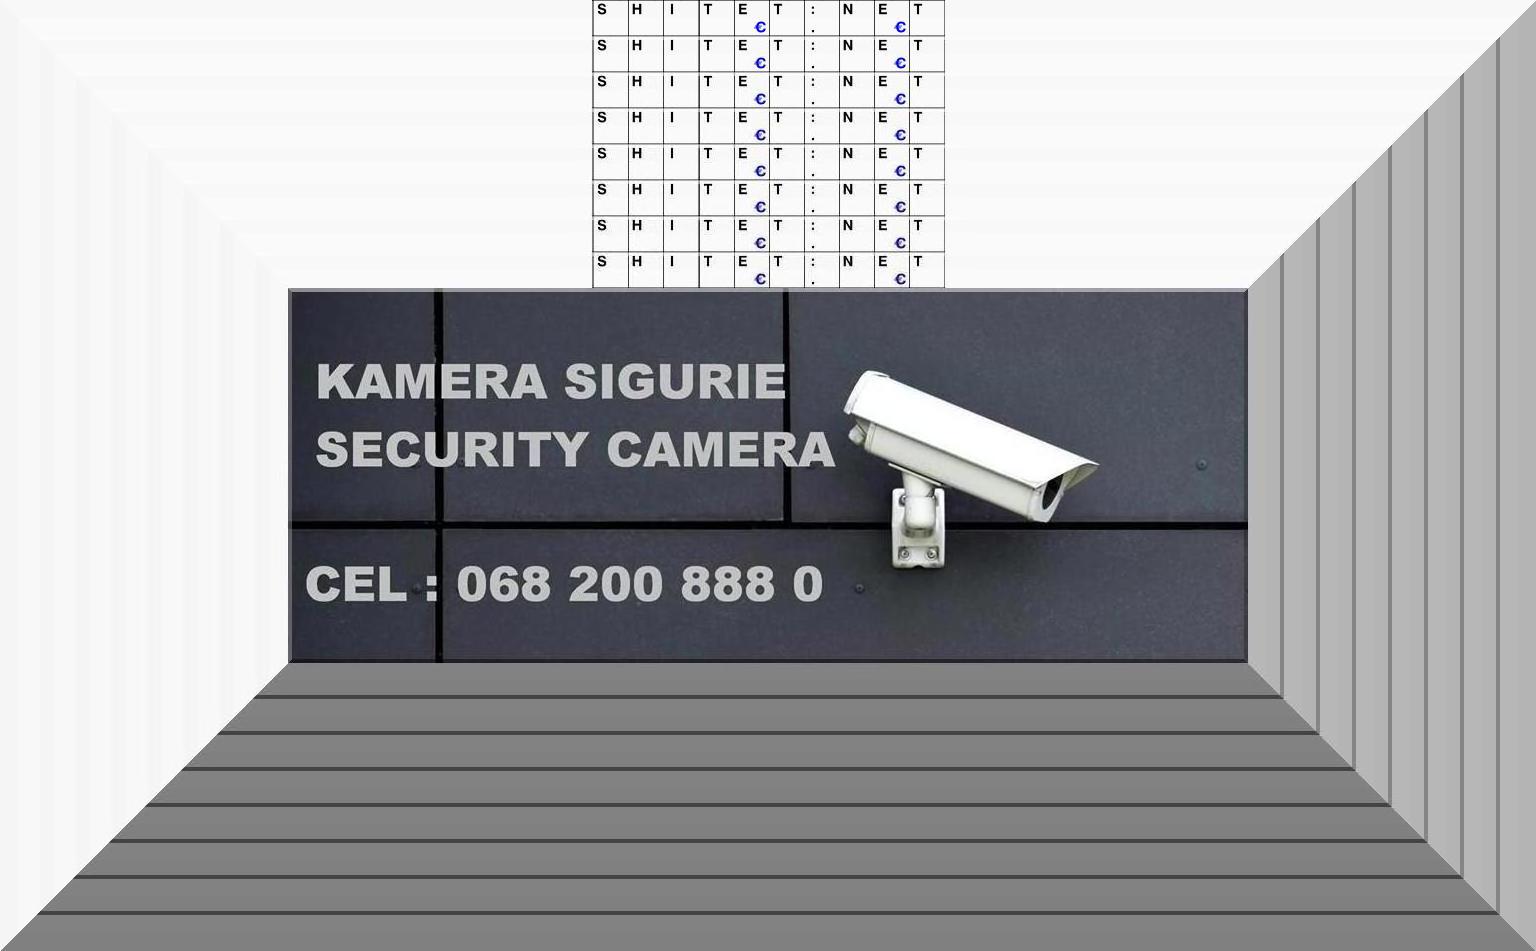 kamera sigurie